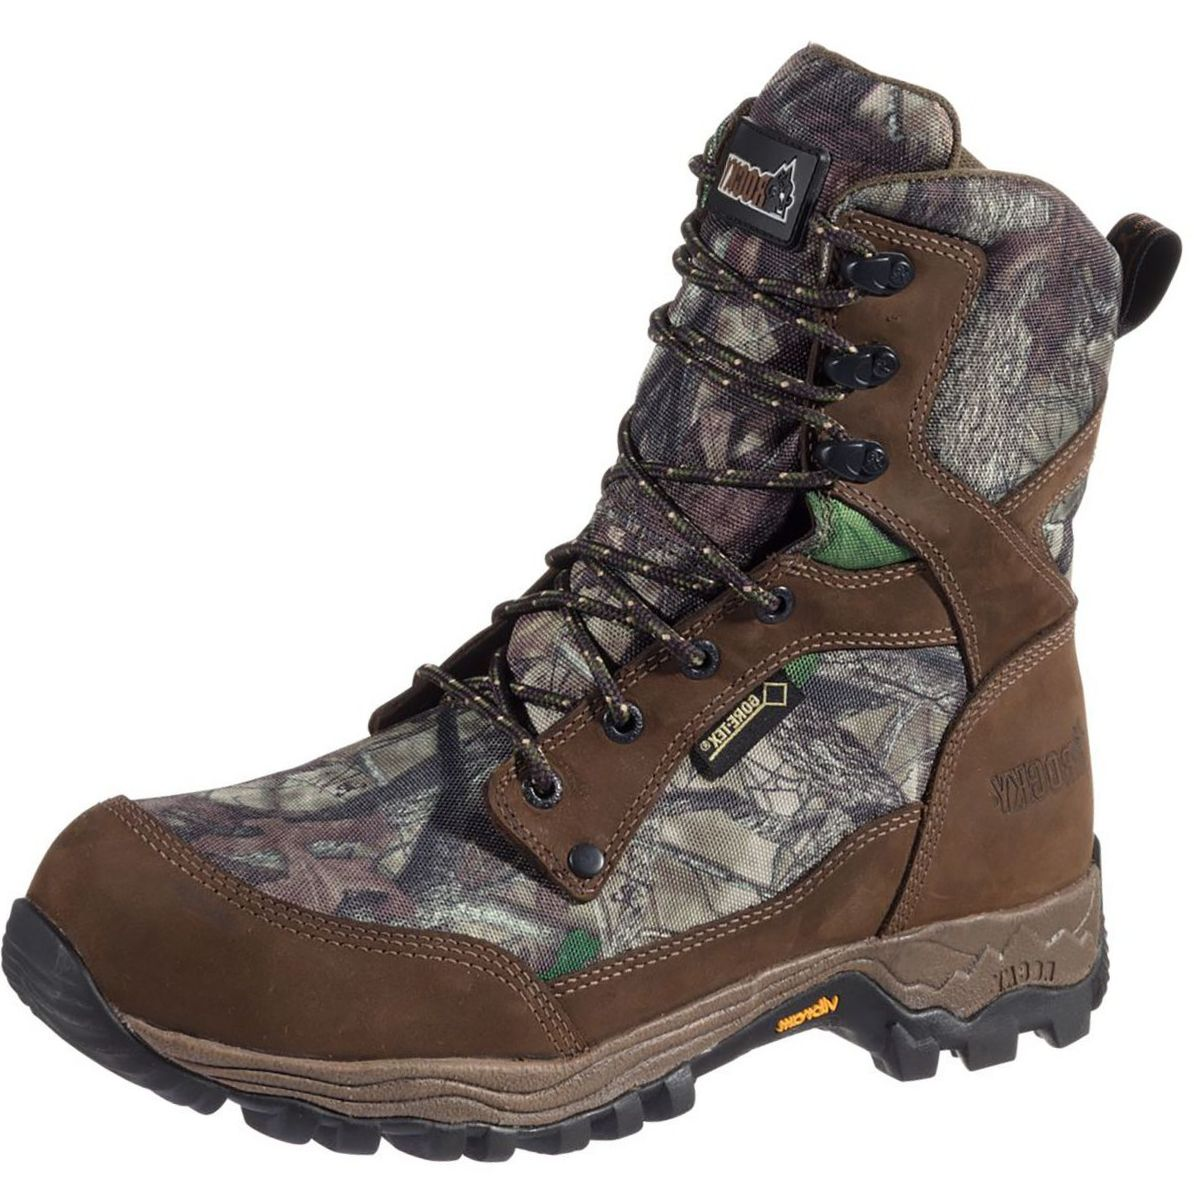 Rocky® Men's Prohunter GORE-TEX® 400-Gram Hunting Boots